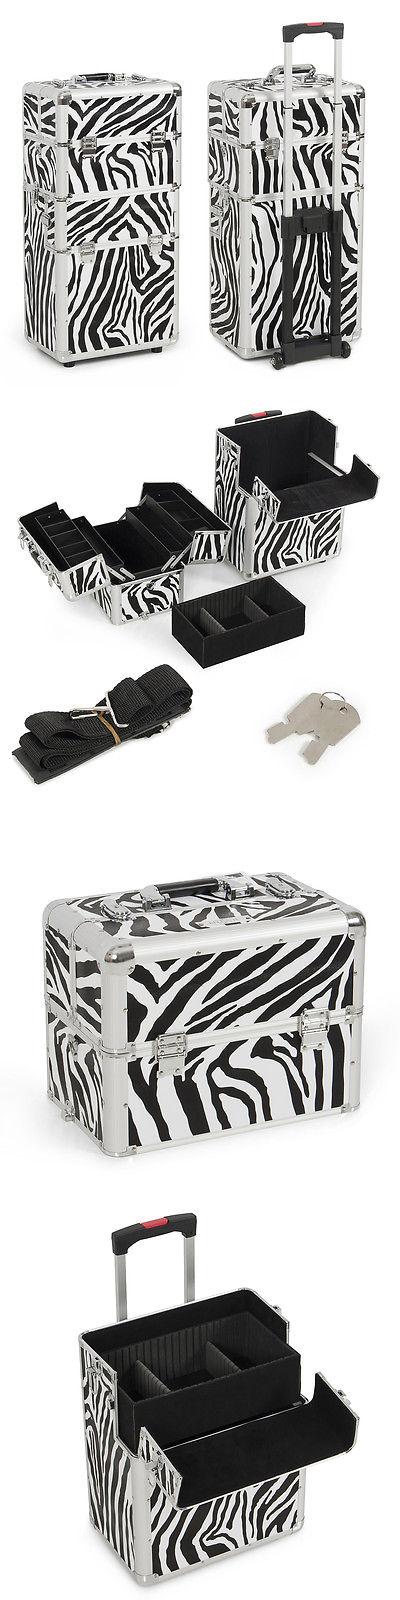 Rolling Makeup Cases In Aluminum Zebra Pro Rolling Makeup - Aluminum trolley case pro rolling makeup cosmetic organizer